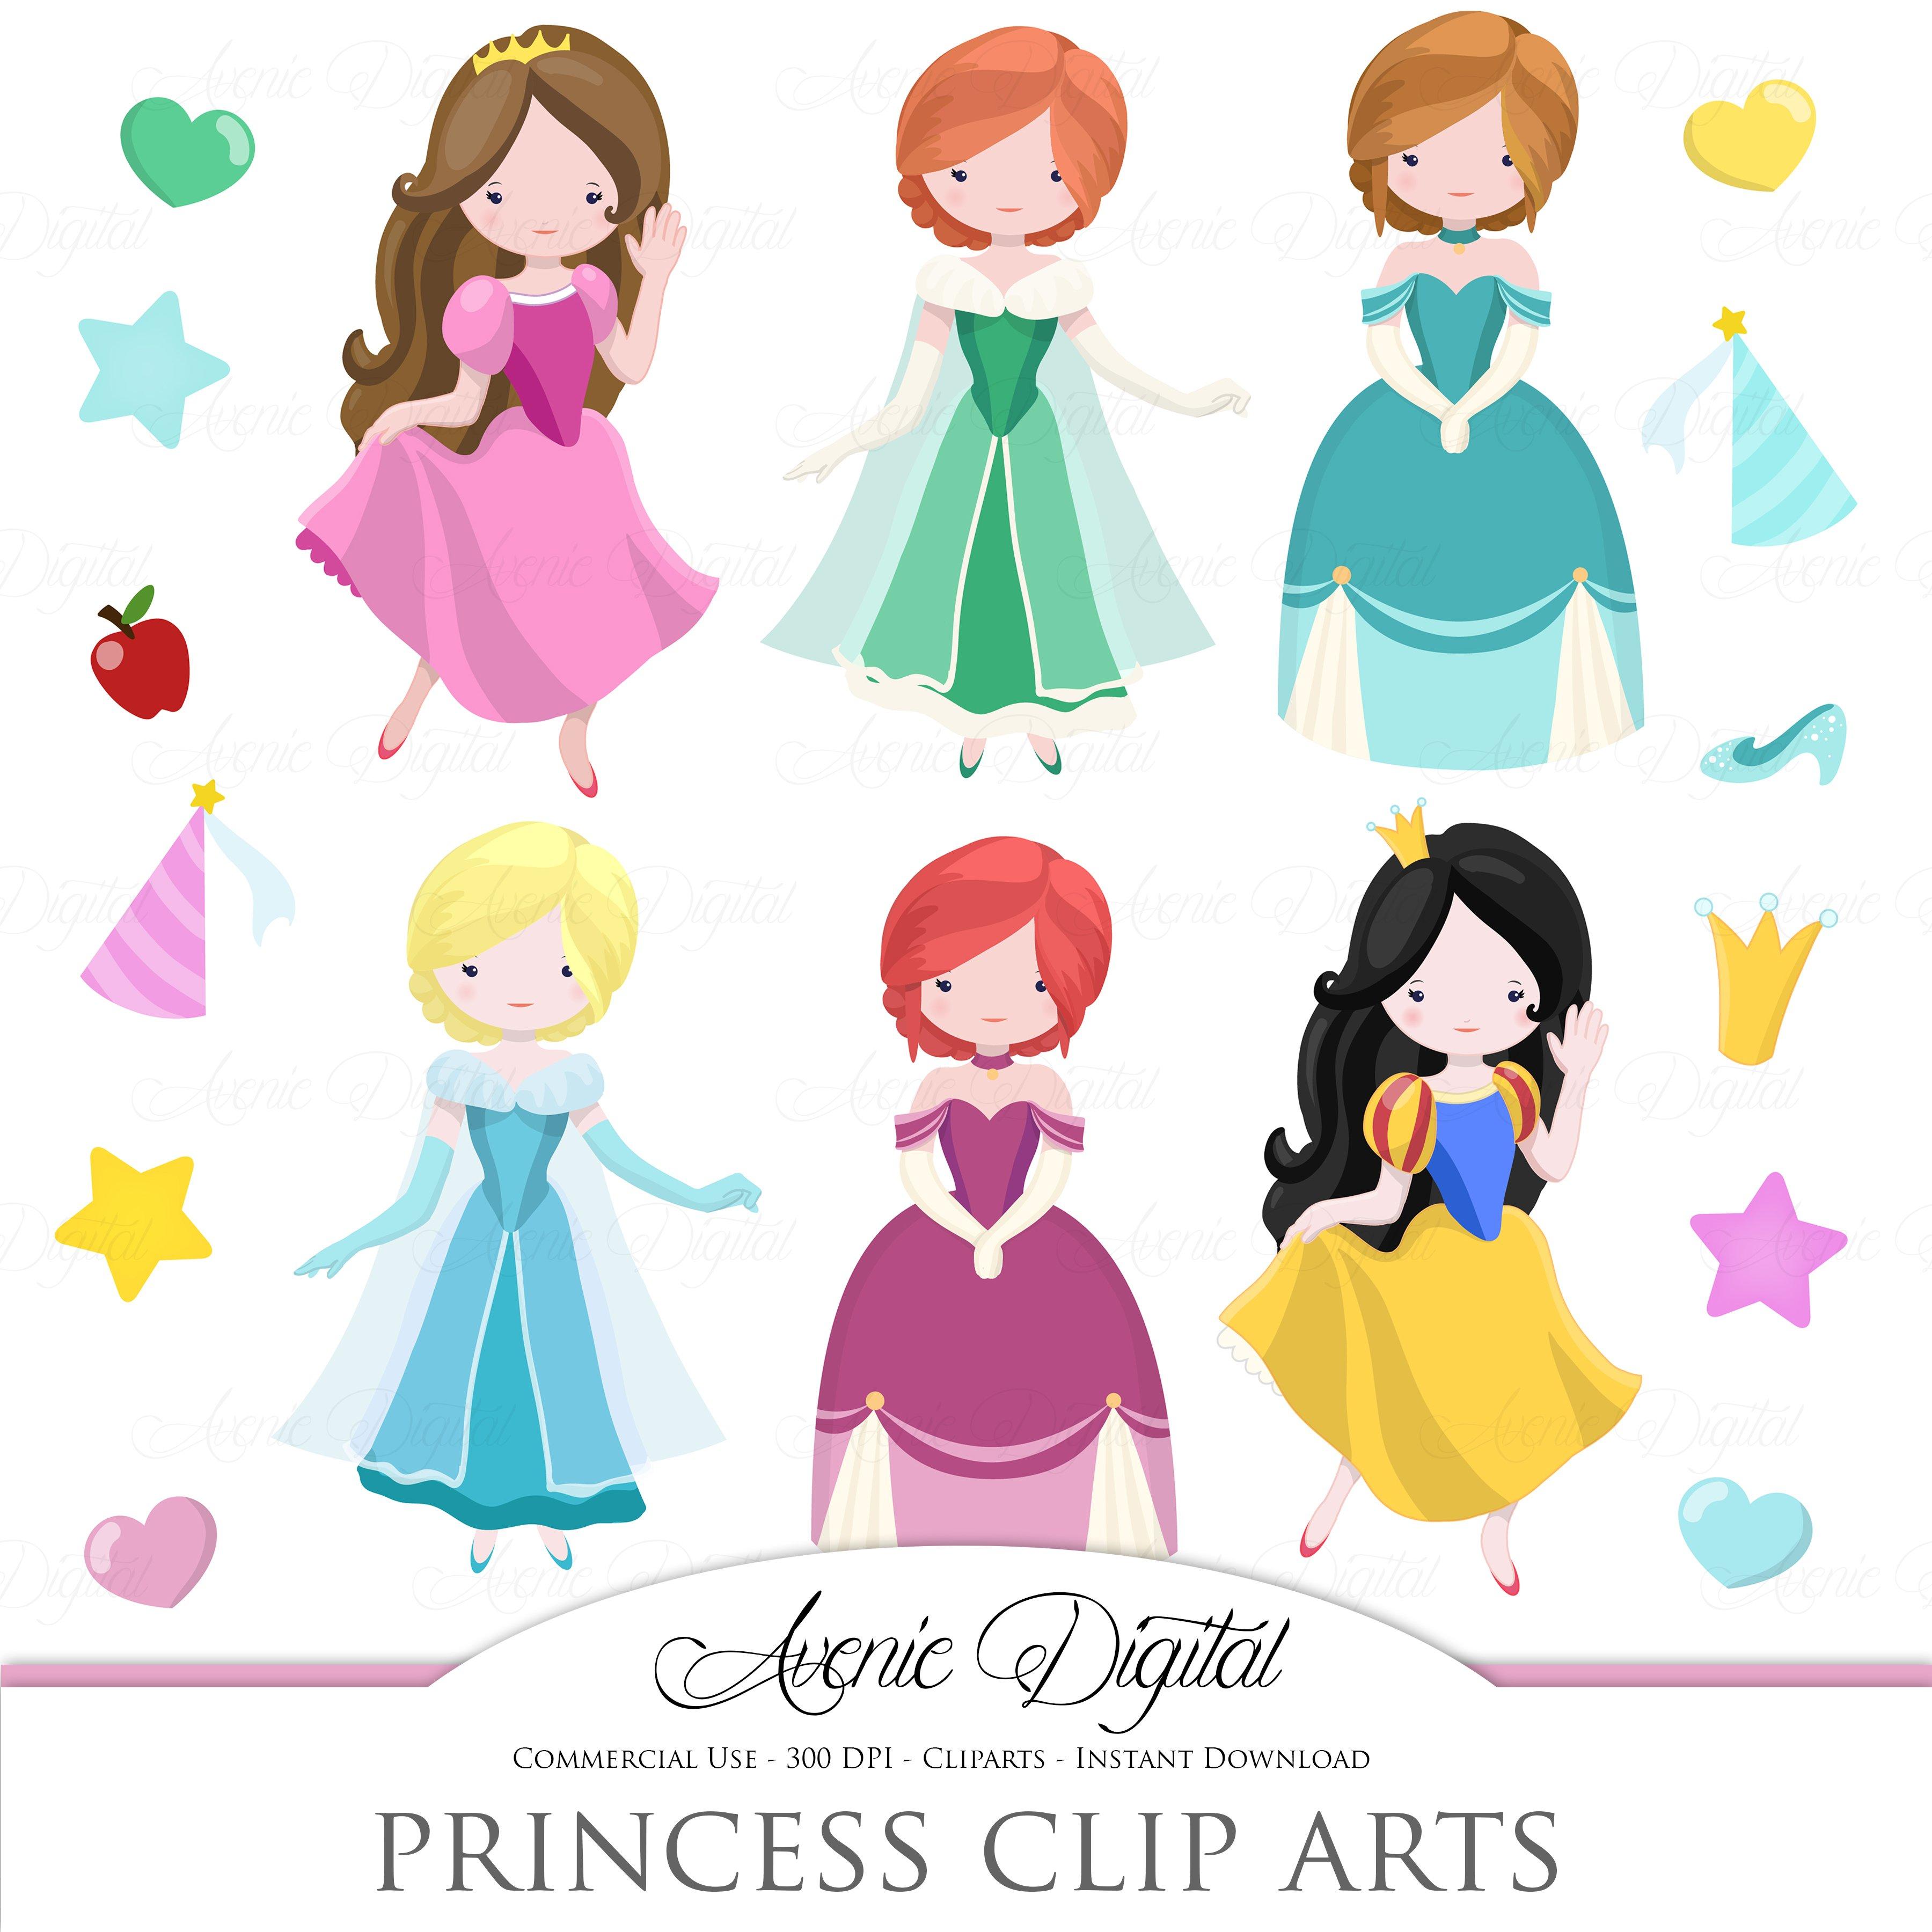 Fairytale Princess Clip Art Vector Illustrations